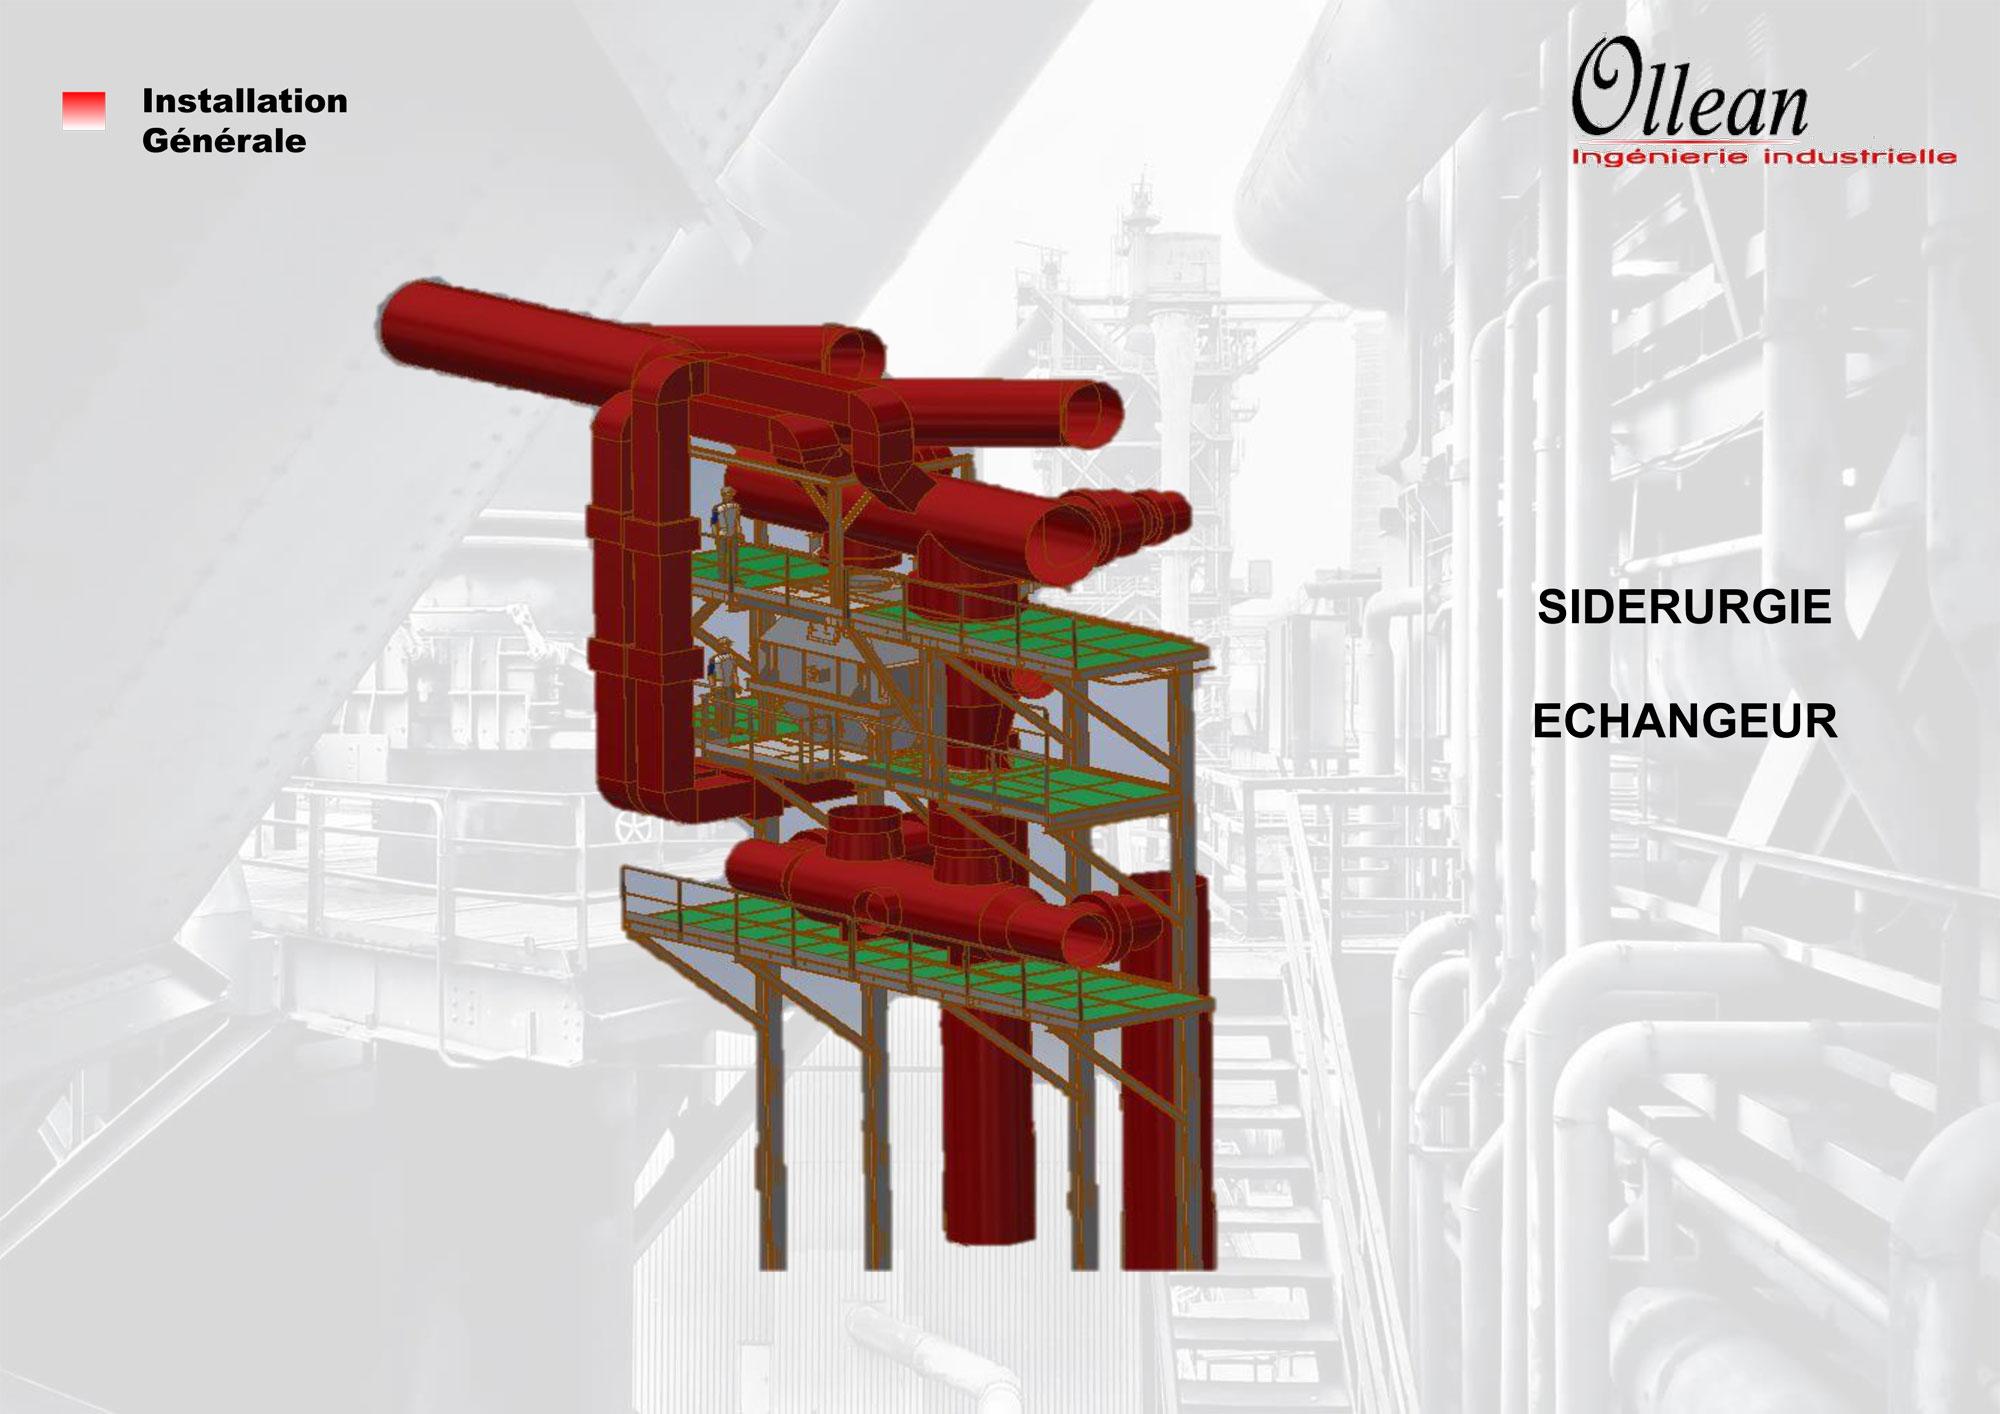 Installation générale - SIDERURGIE ECHANGEUR